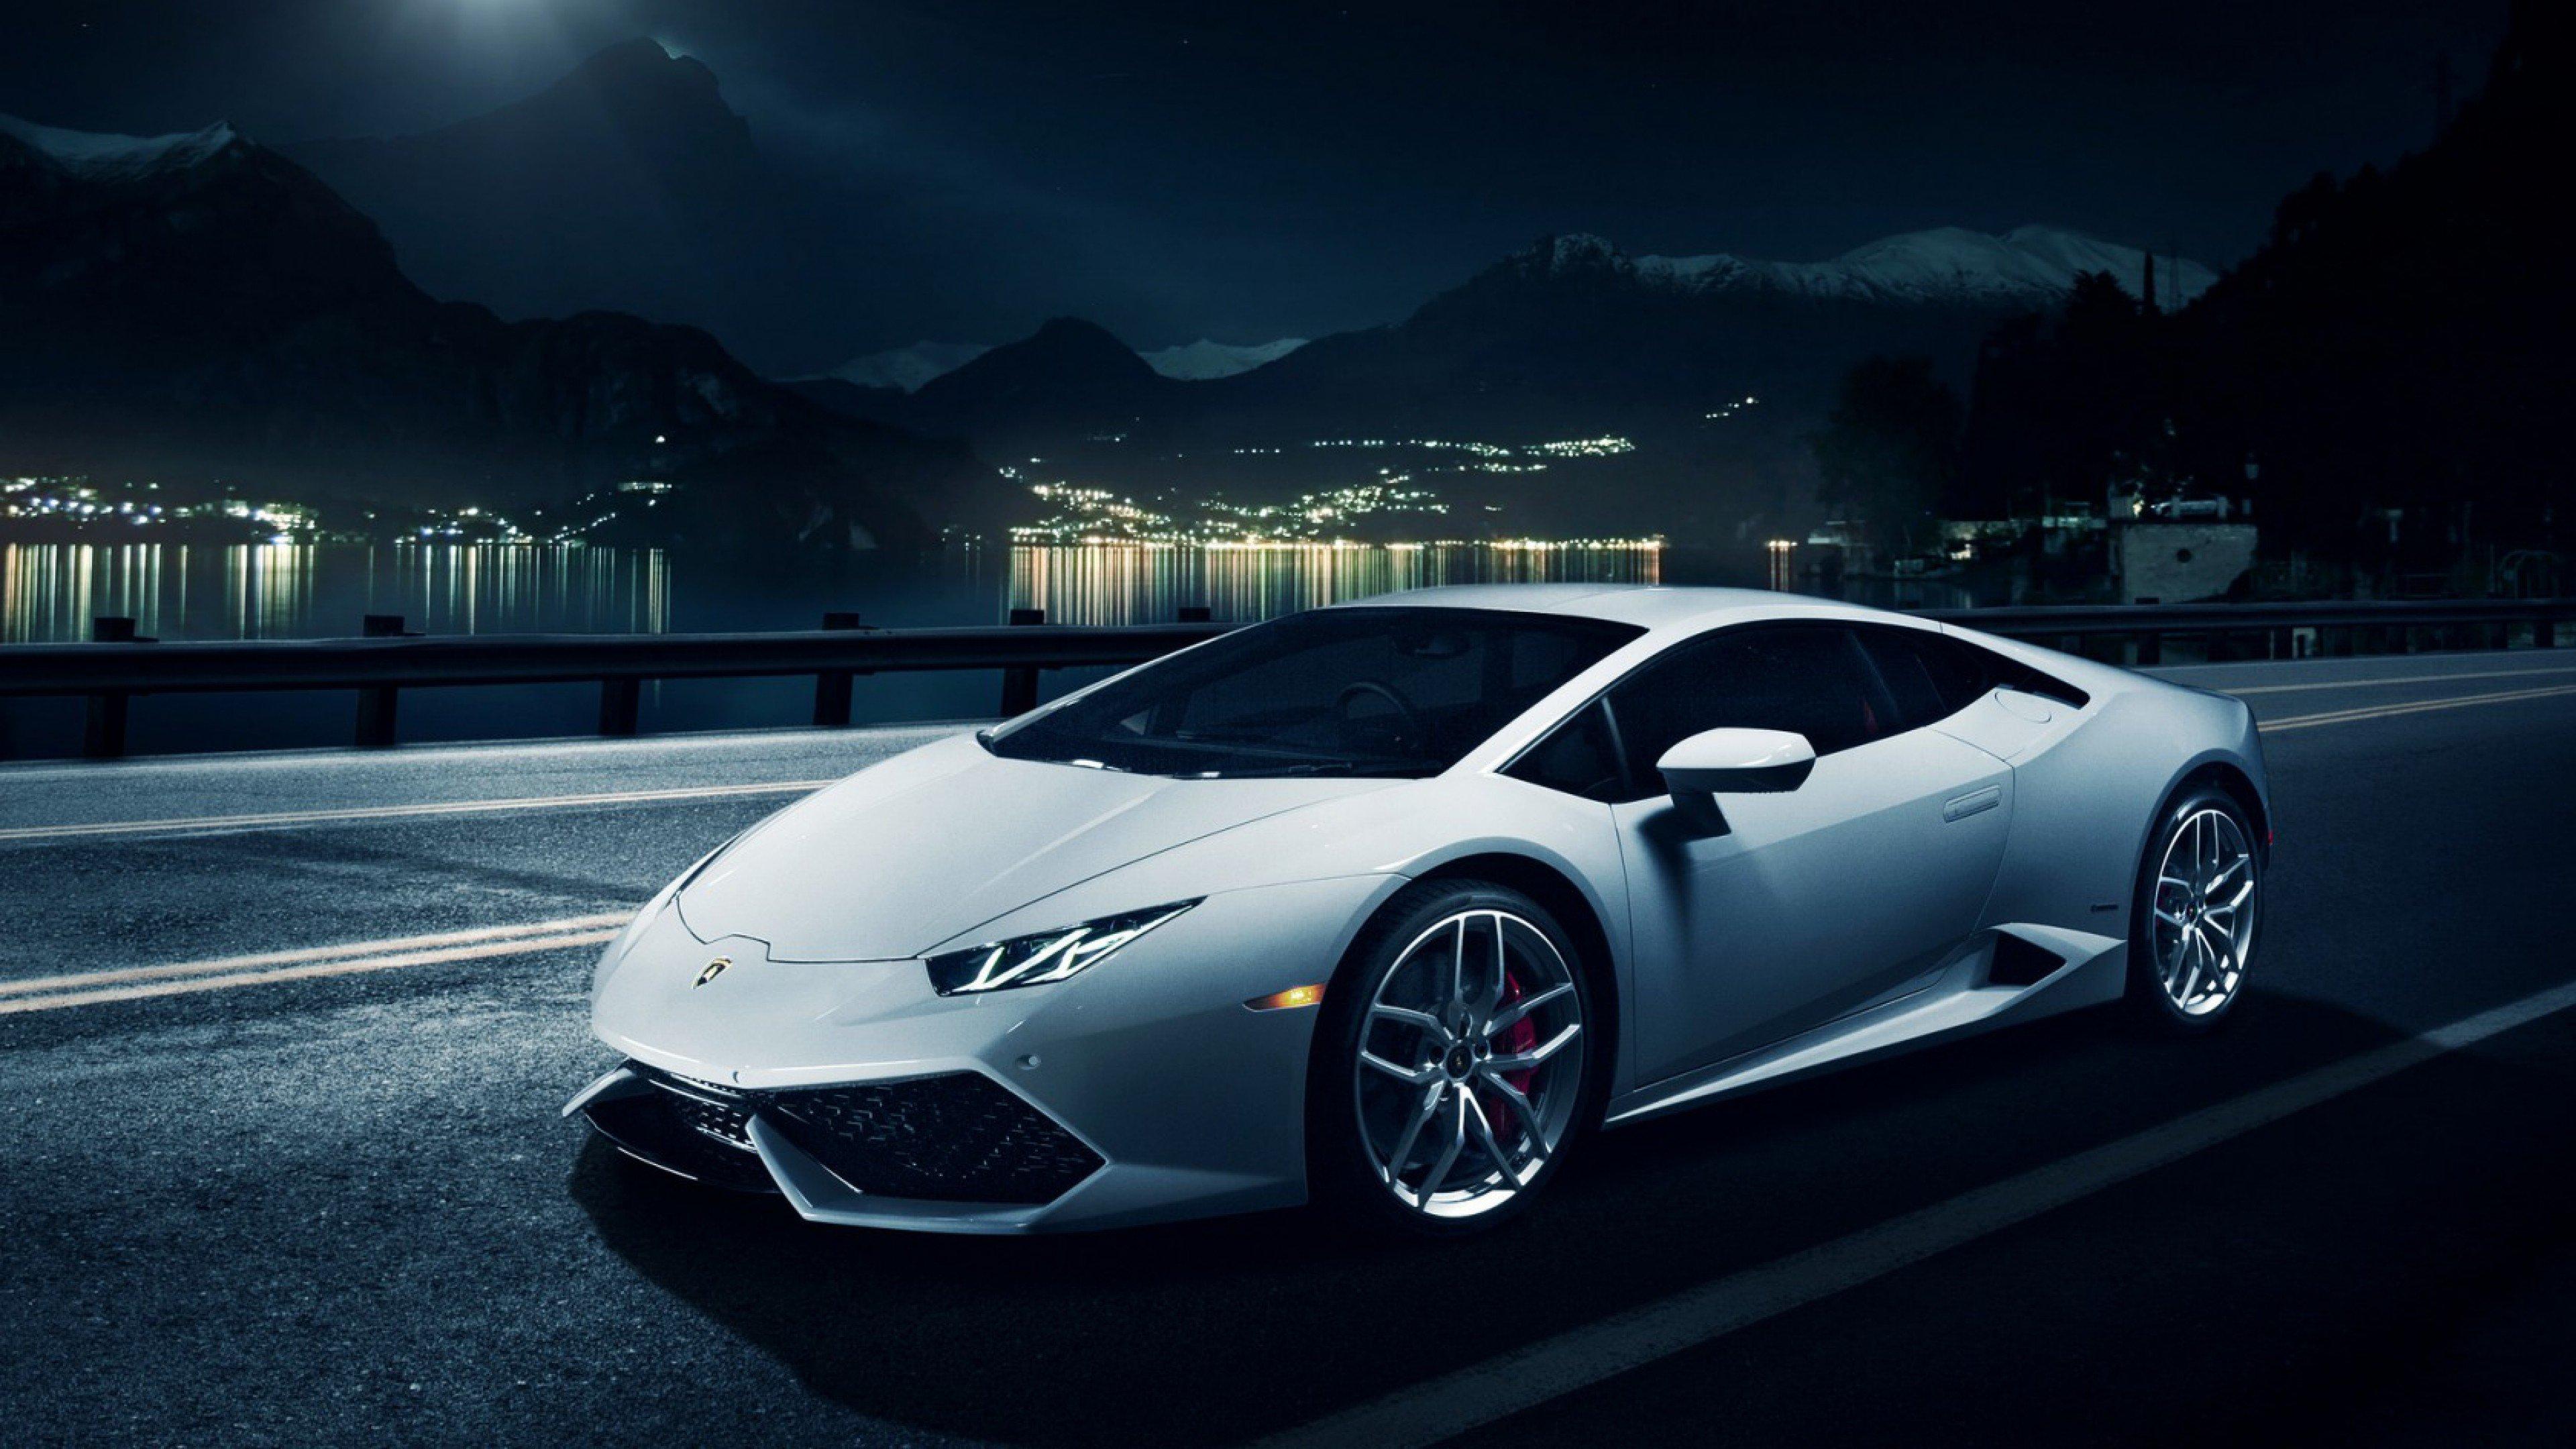 1360x768 Lamborghini Huracan Hd Laptop Hd Hd 4k Wallpapers